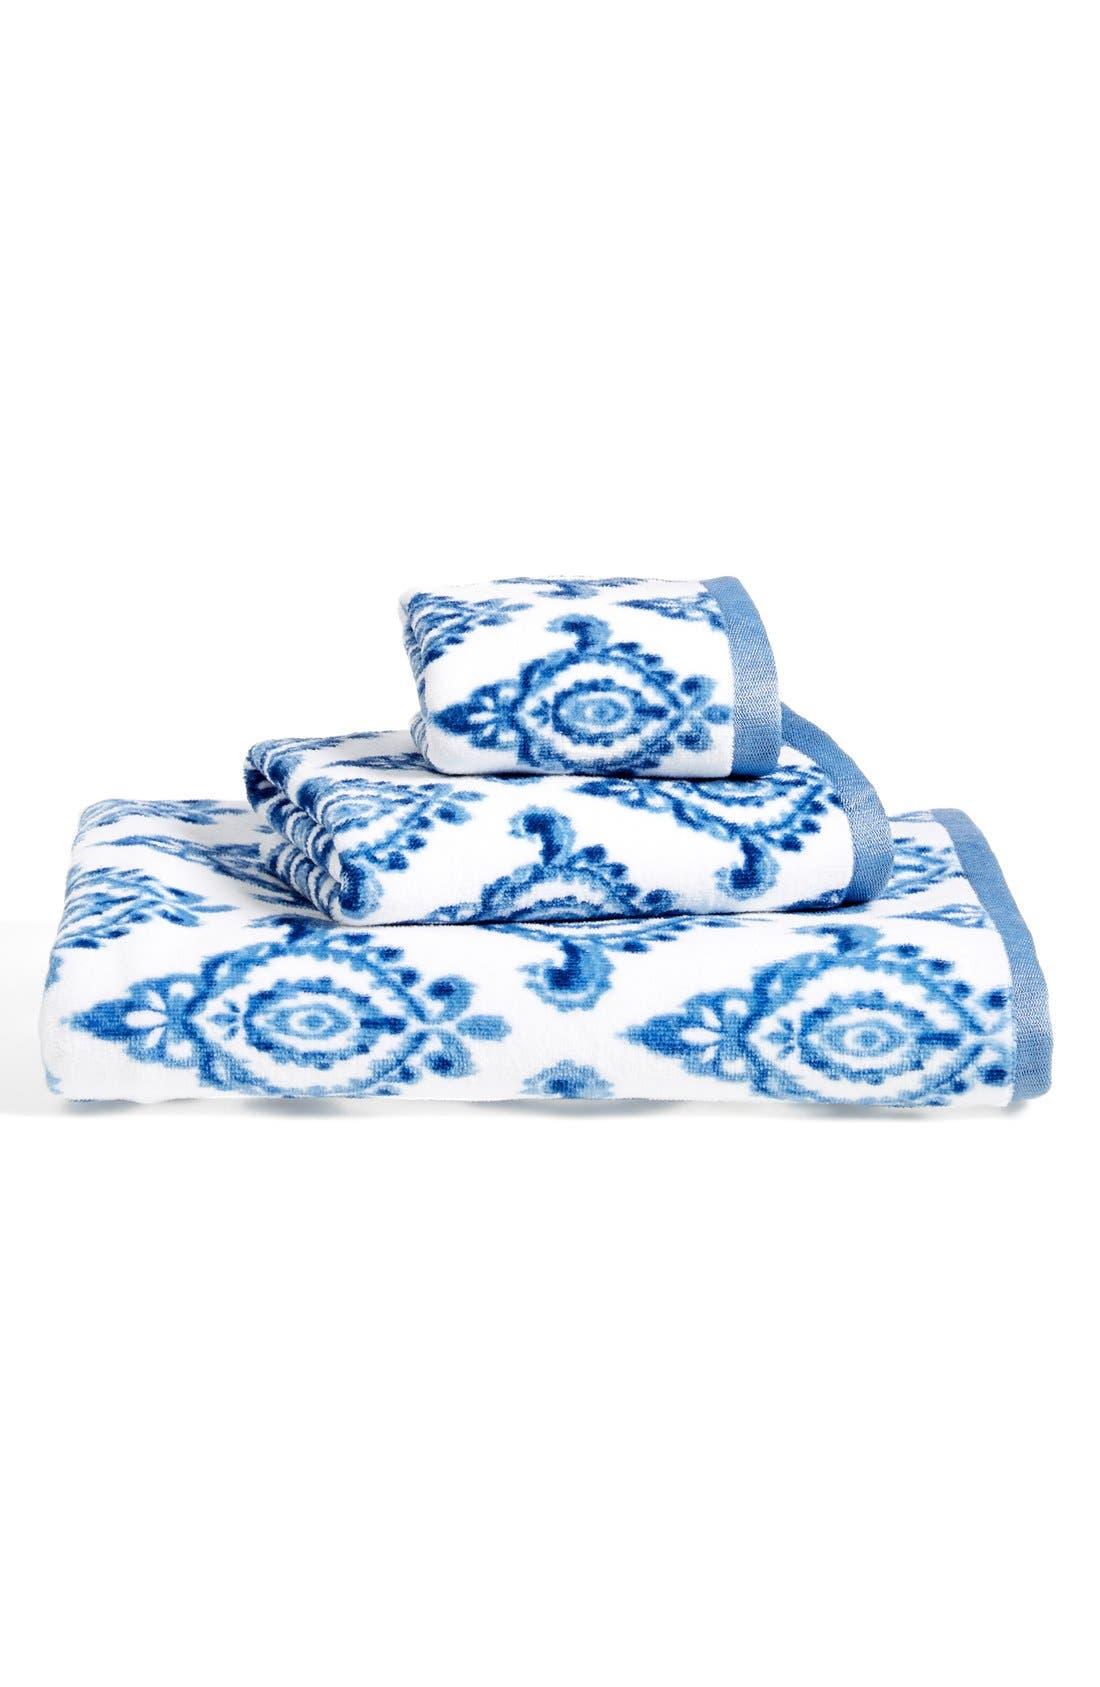 DENA HOME, 'Madison' Ikat Print Bath Towel, Alternate thumbnail 3, color, 410